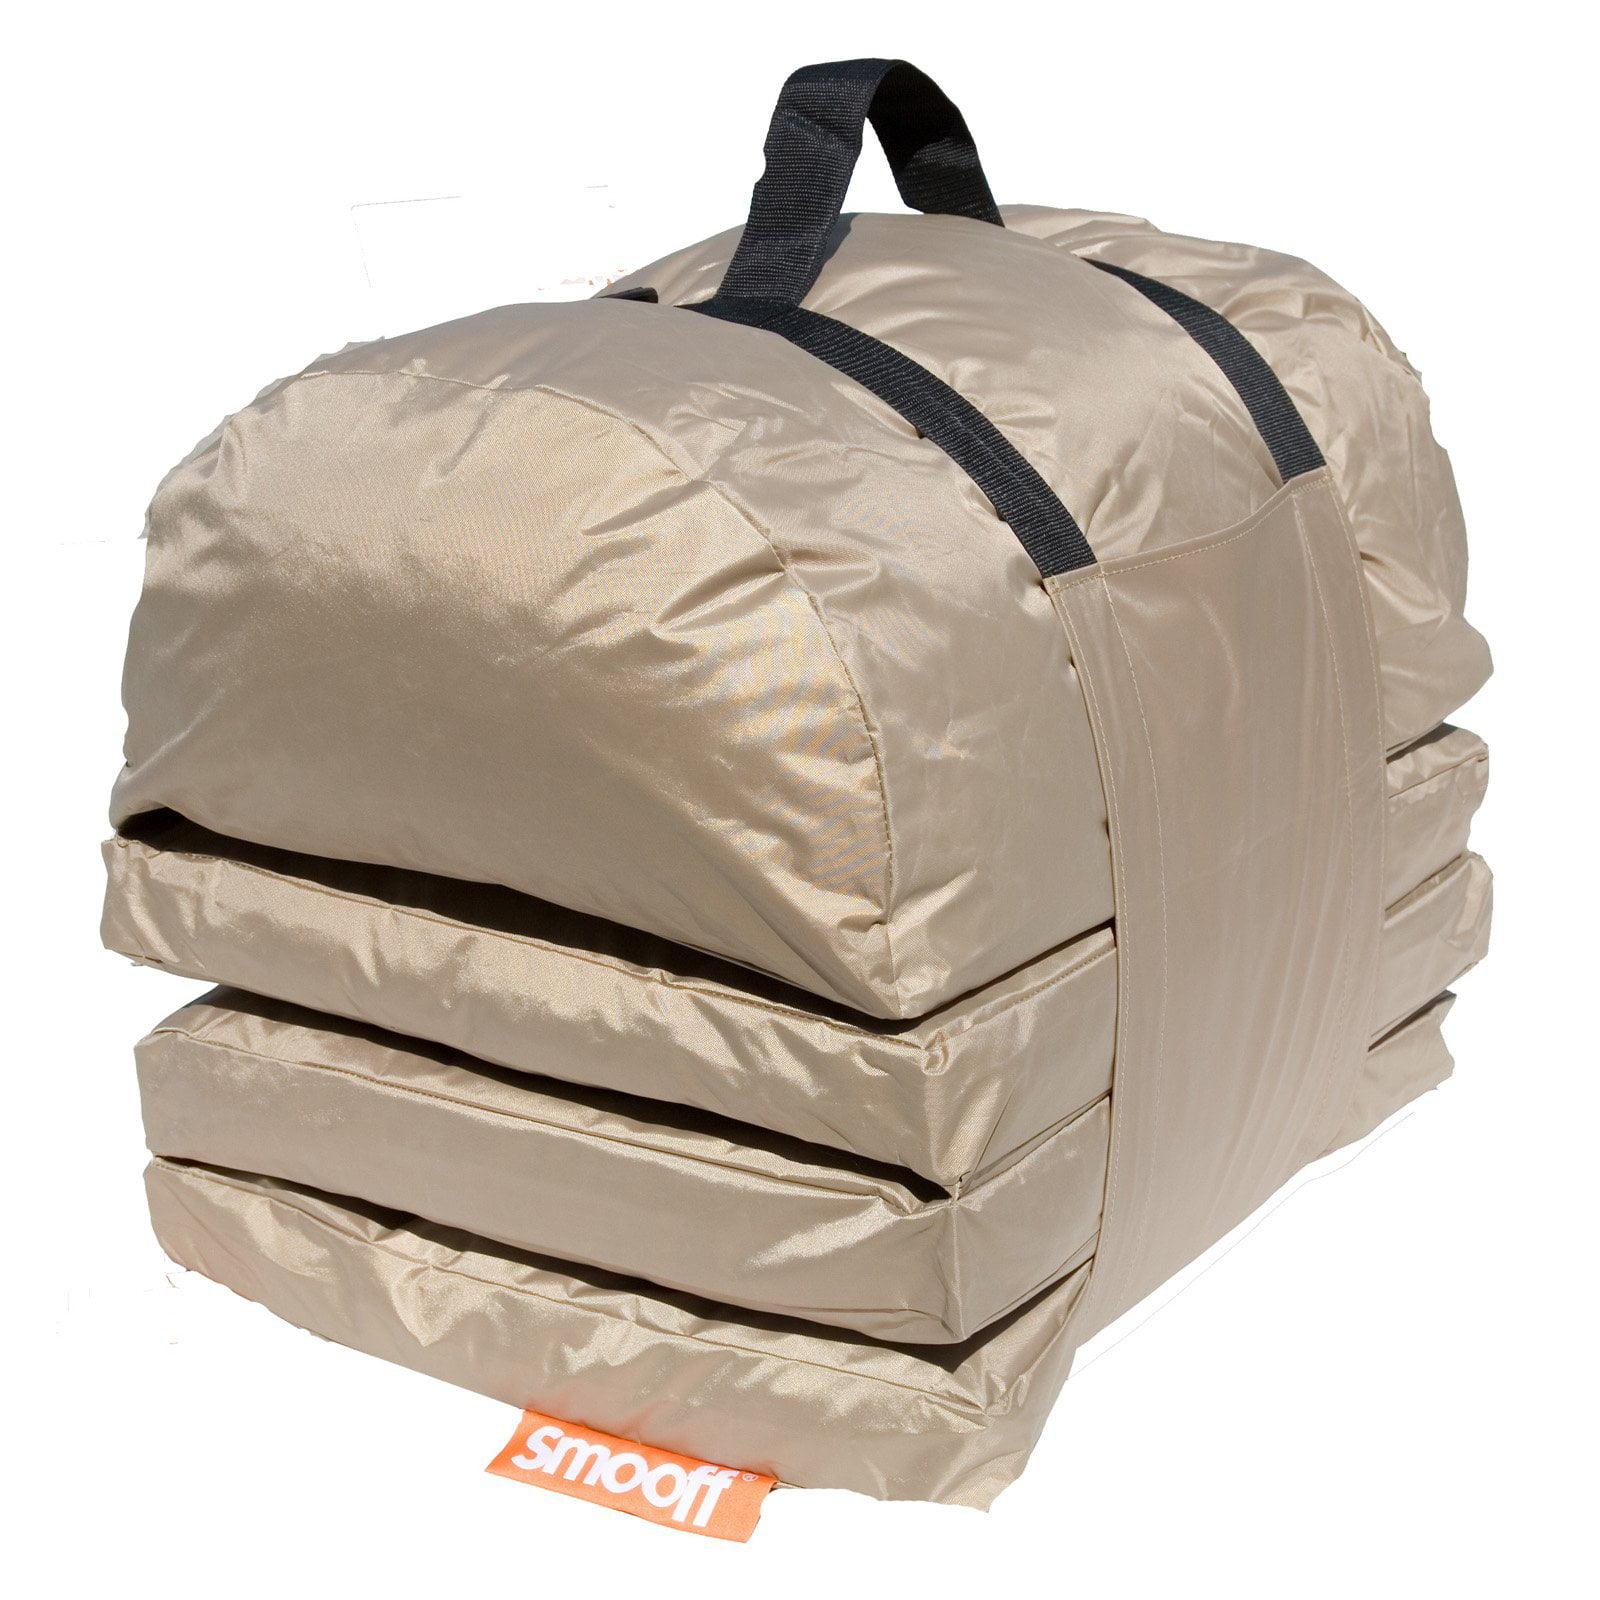 Textrade International Smooff Lounge Cushy Camping Mat